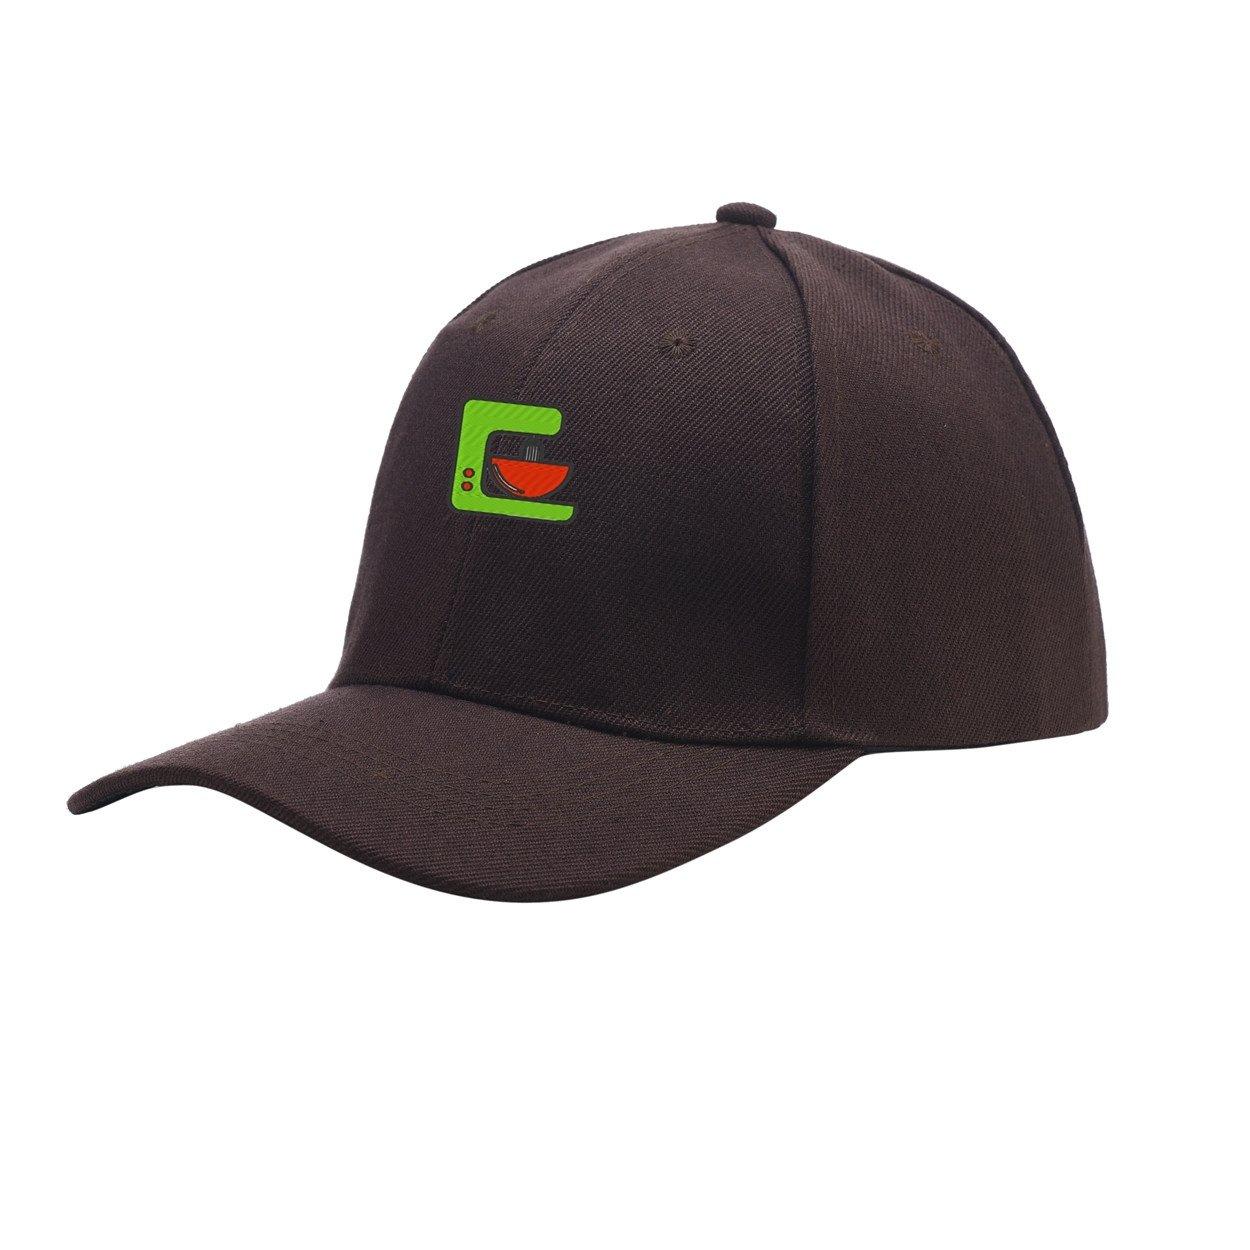 NeeKer Kitchen Mixer Peaked Hat Embroidered Logo Adjustable Dad Cap